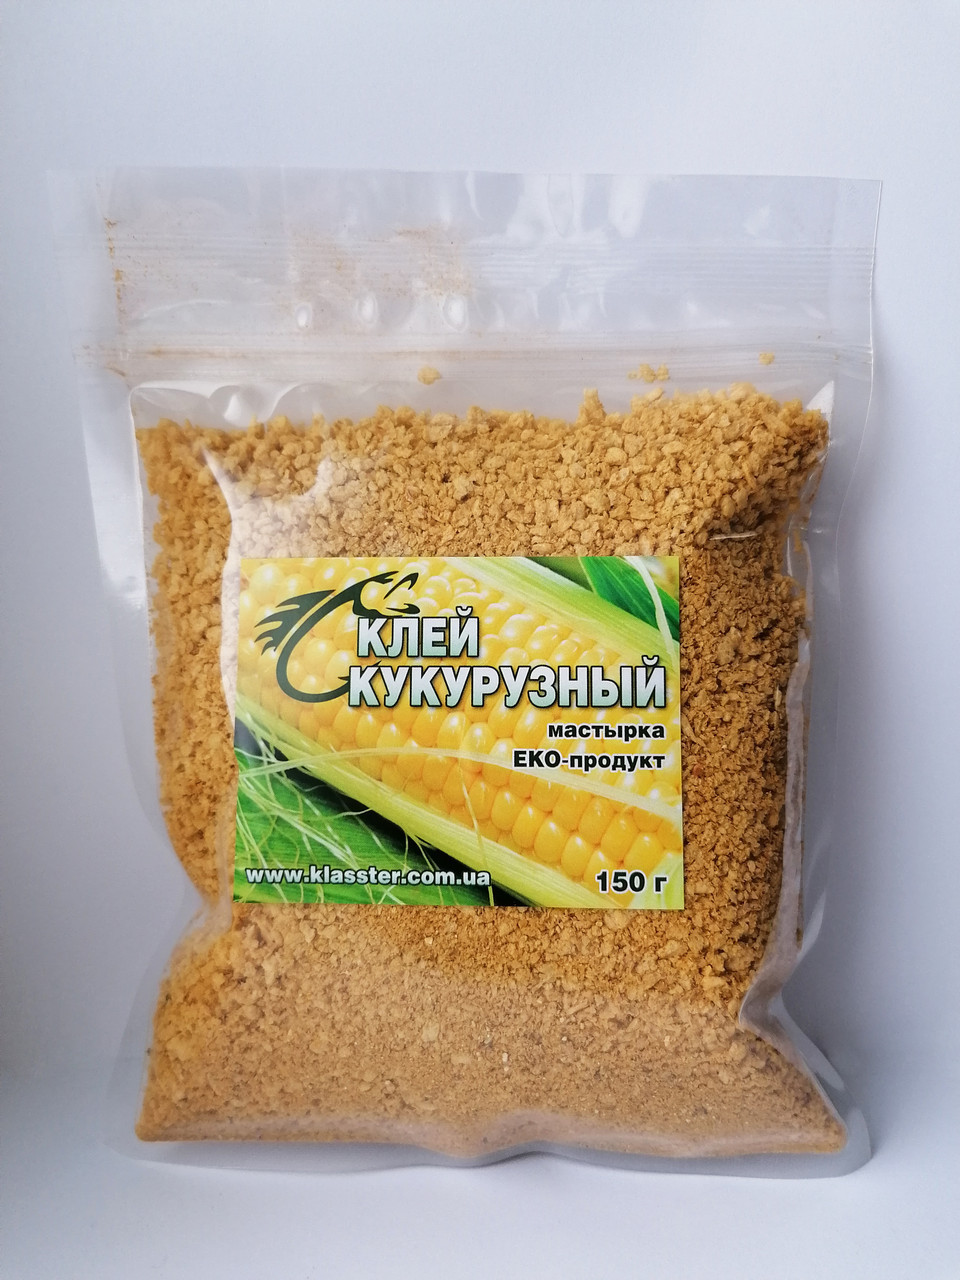 Активатор клева Klasster Клей мастырка кукурузная 150г